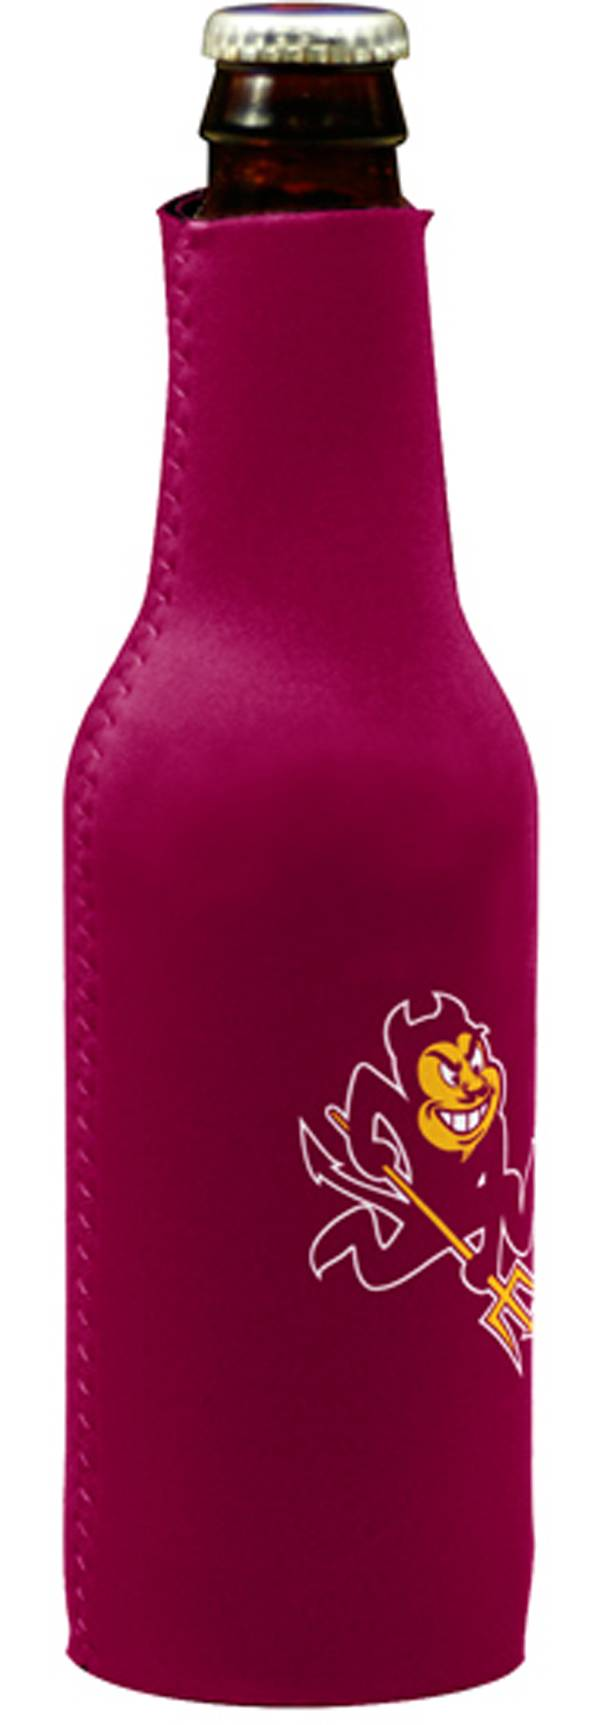 Arizona State Sun Devils Bottle Koozie product image